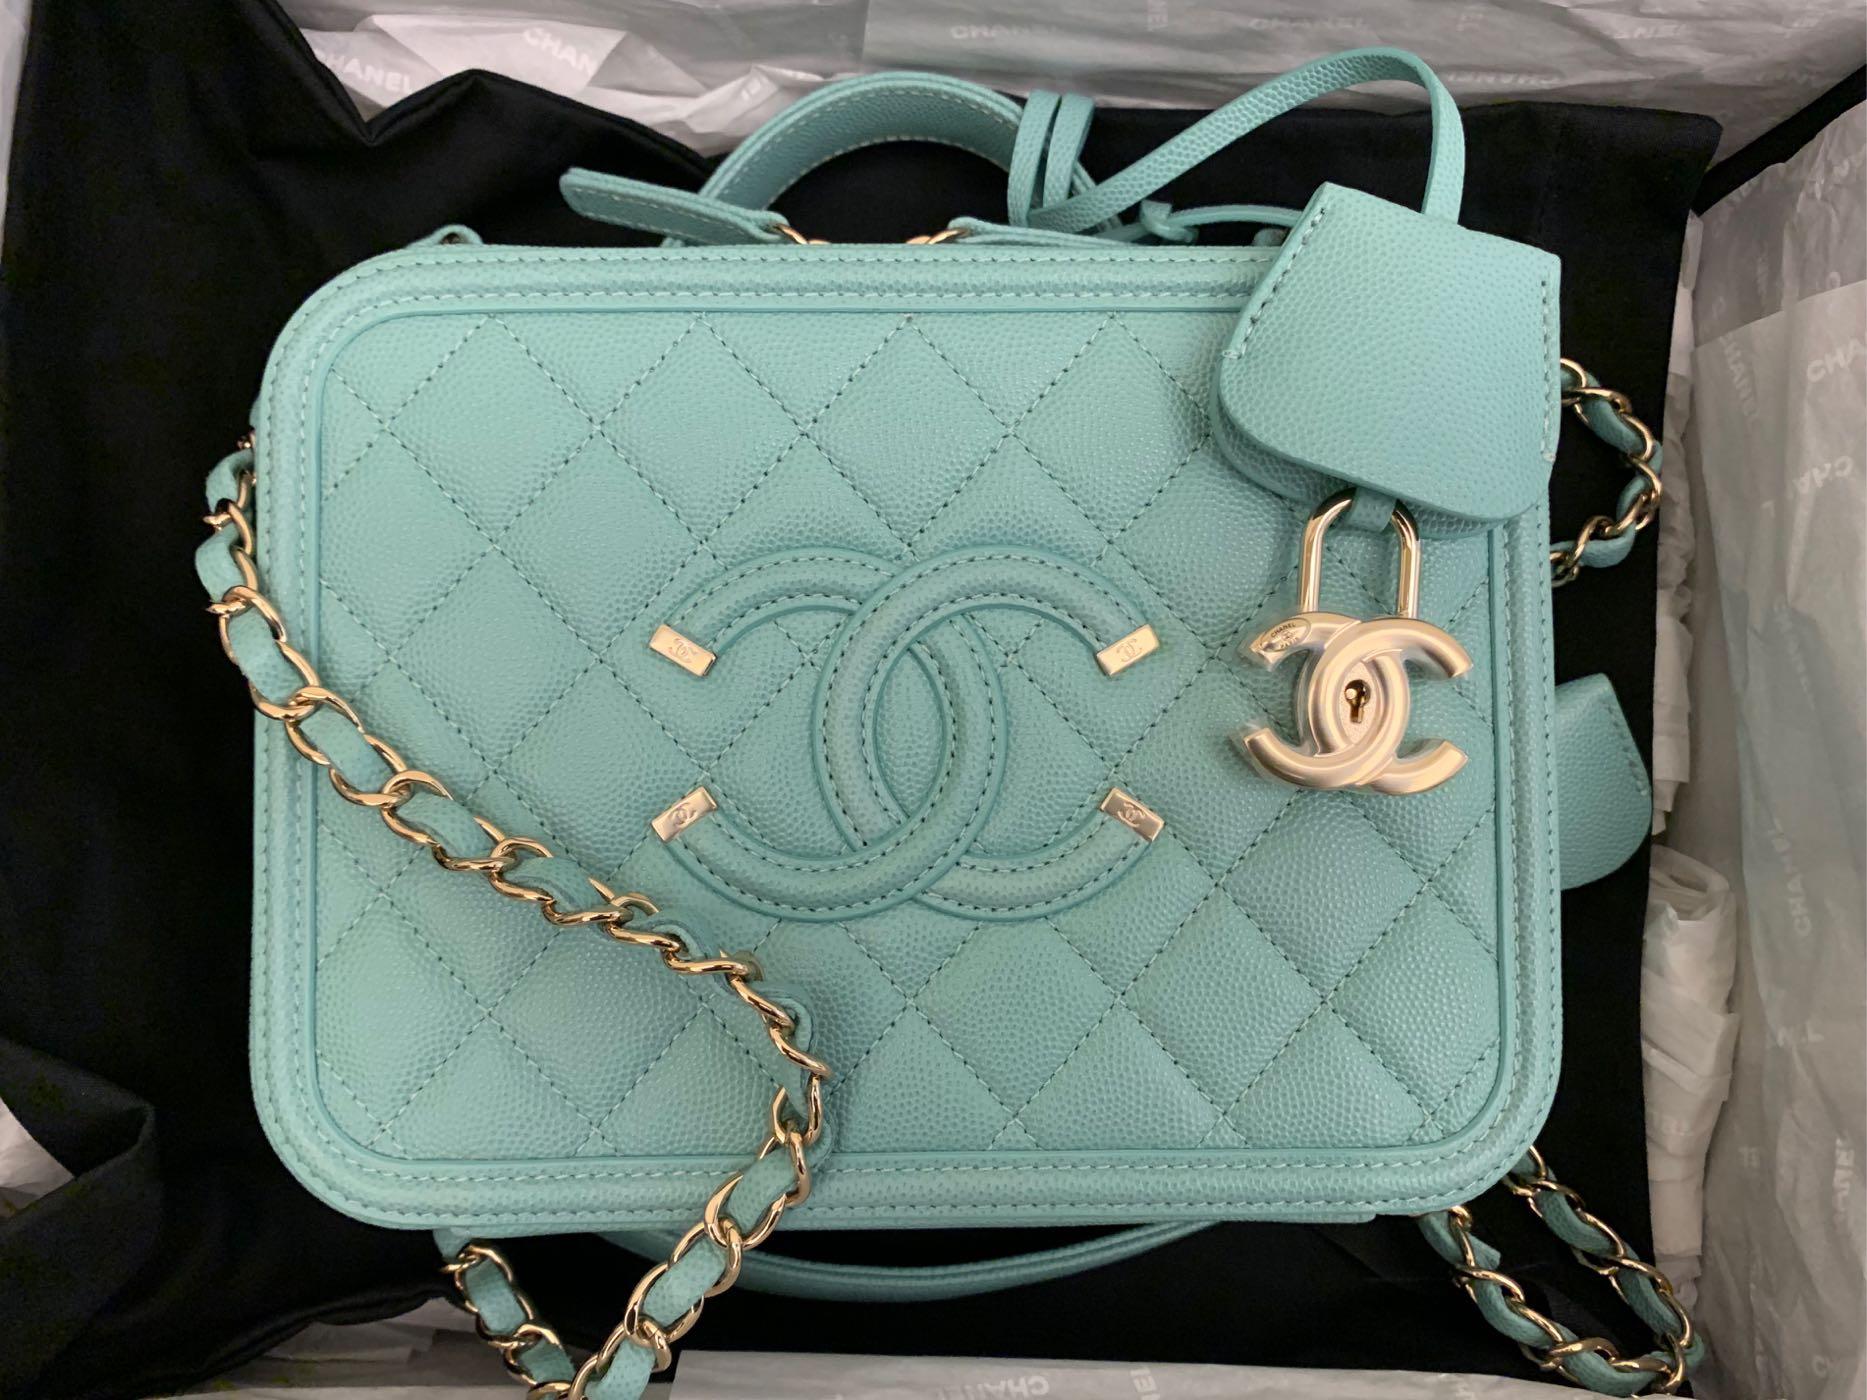 香奈兒 化妝箱 Chanel vanity21 ❤️2020蒂芬妮藍❤️